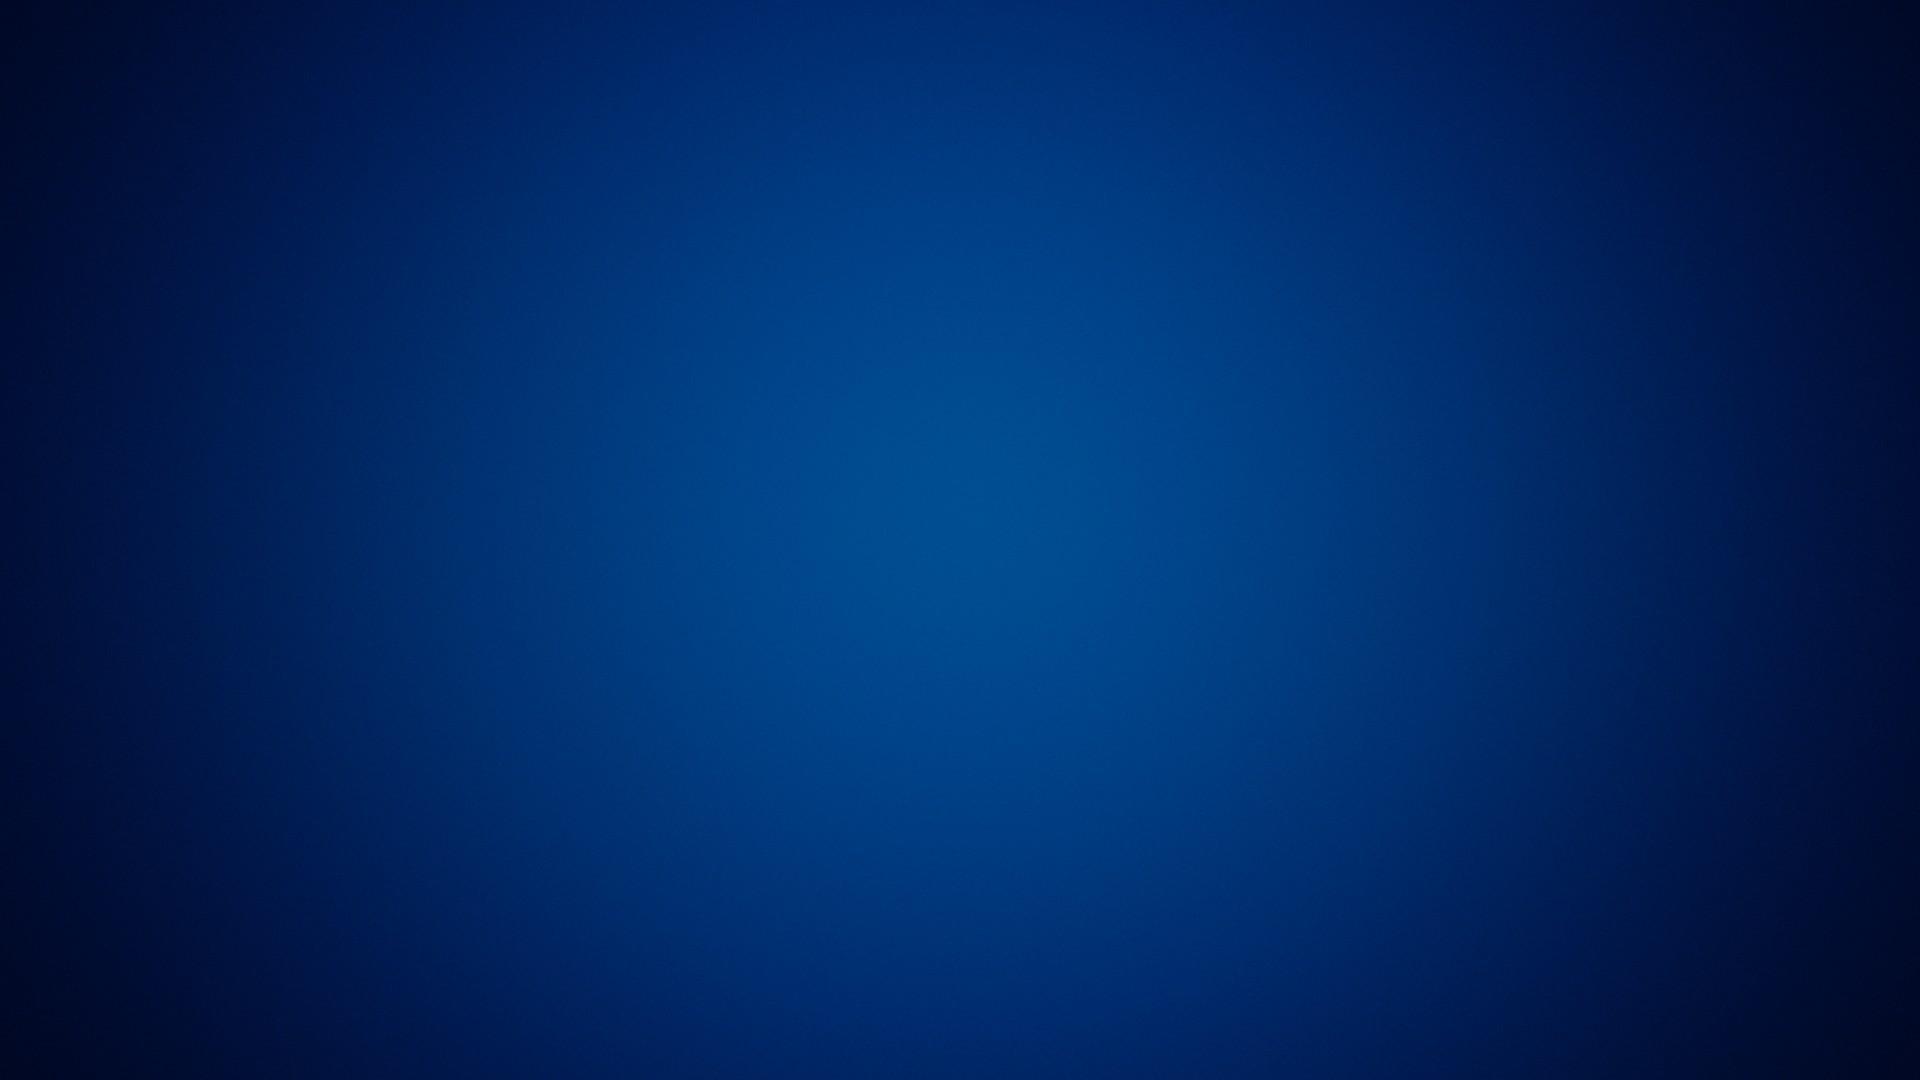 66 Blue Wallpaper Hd